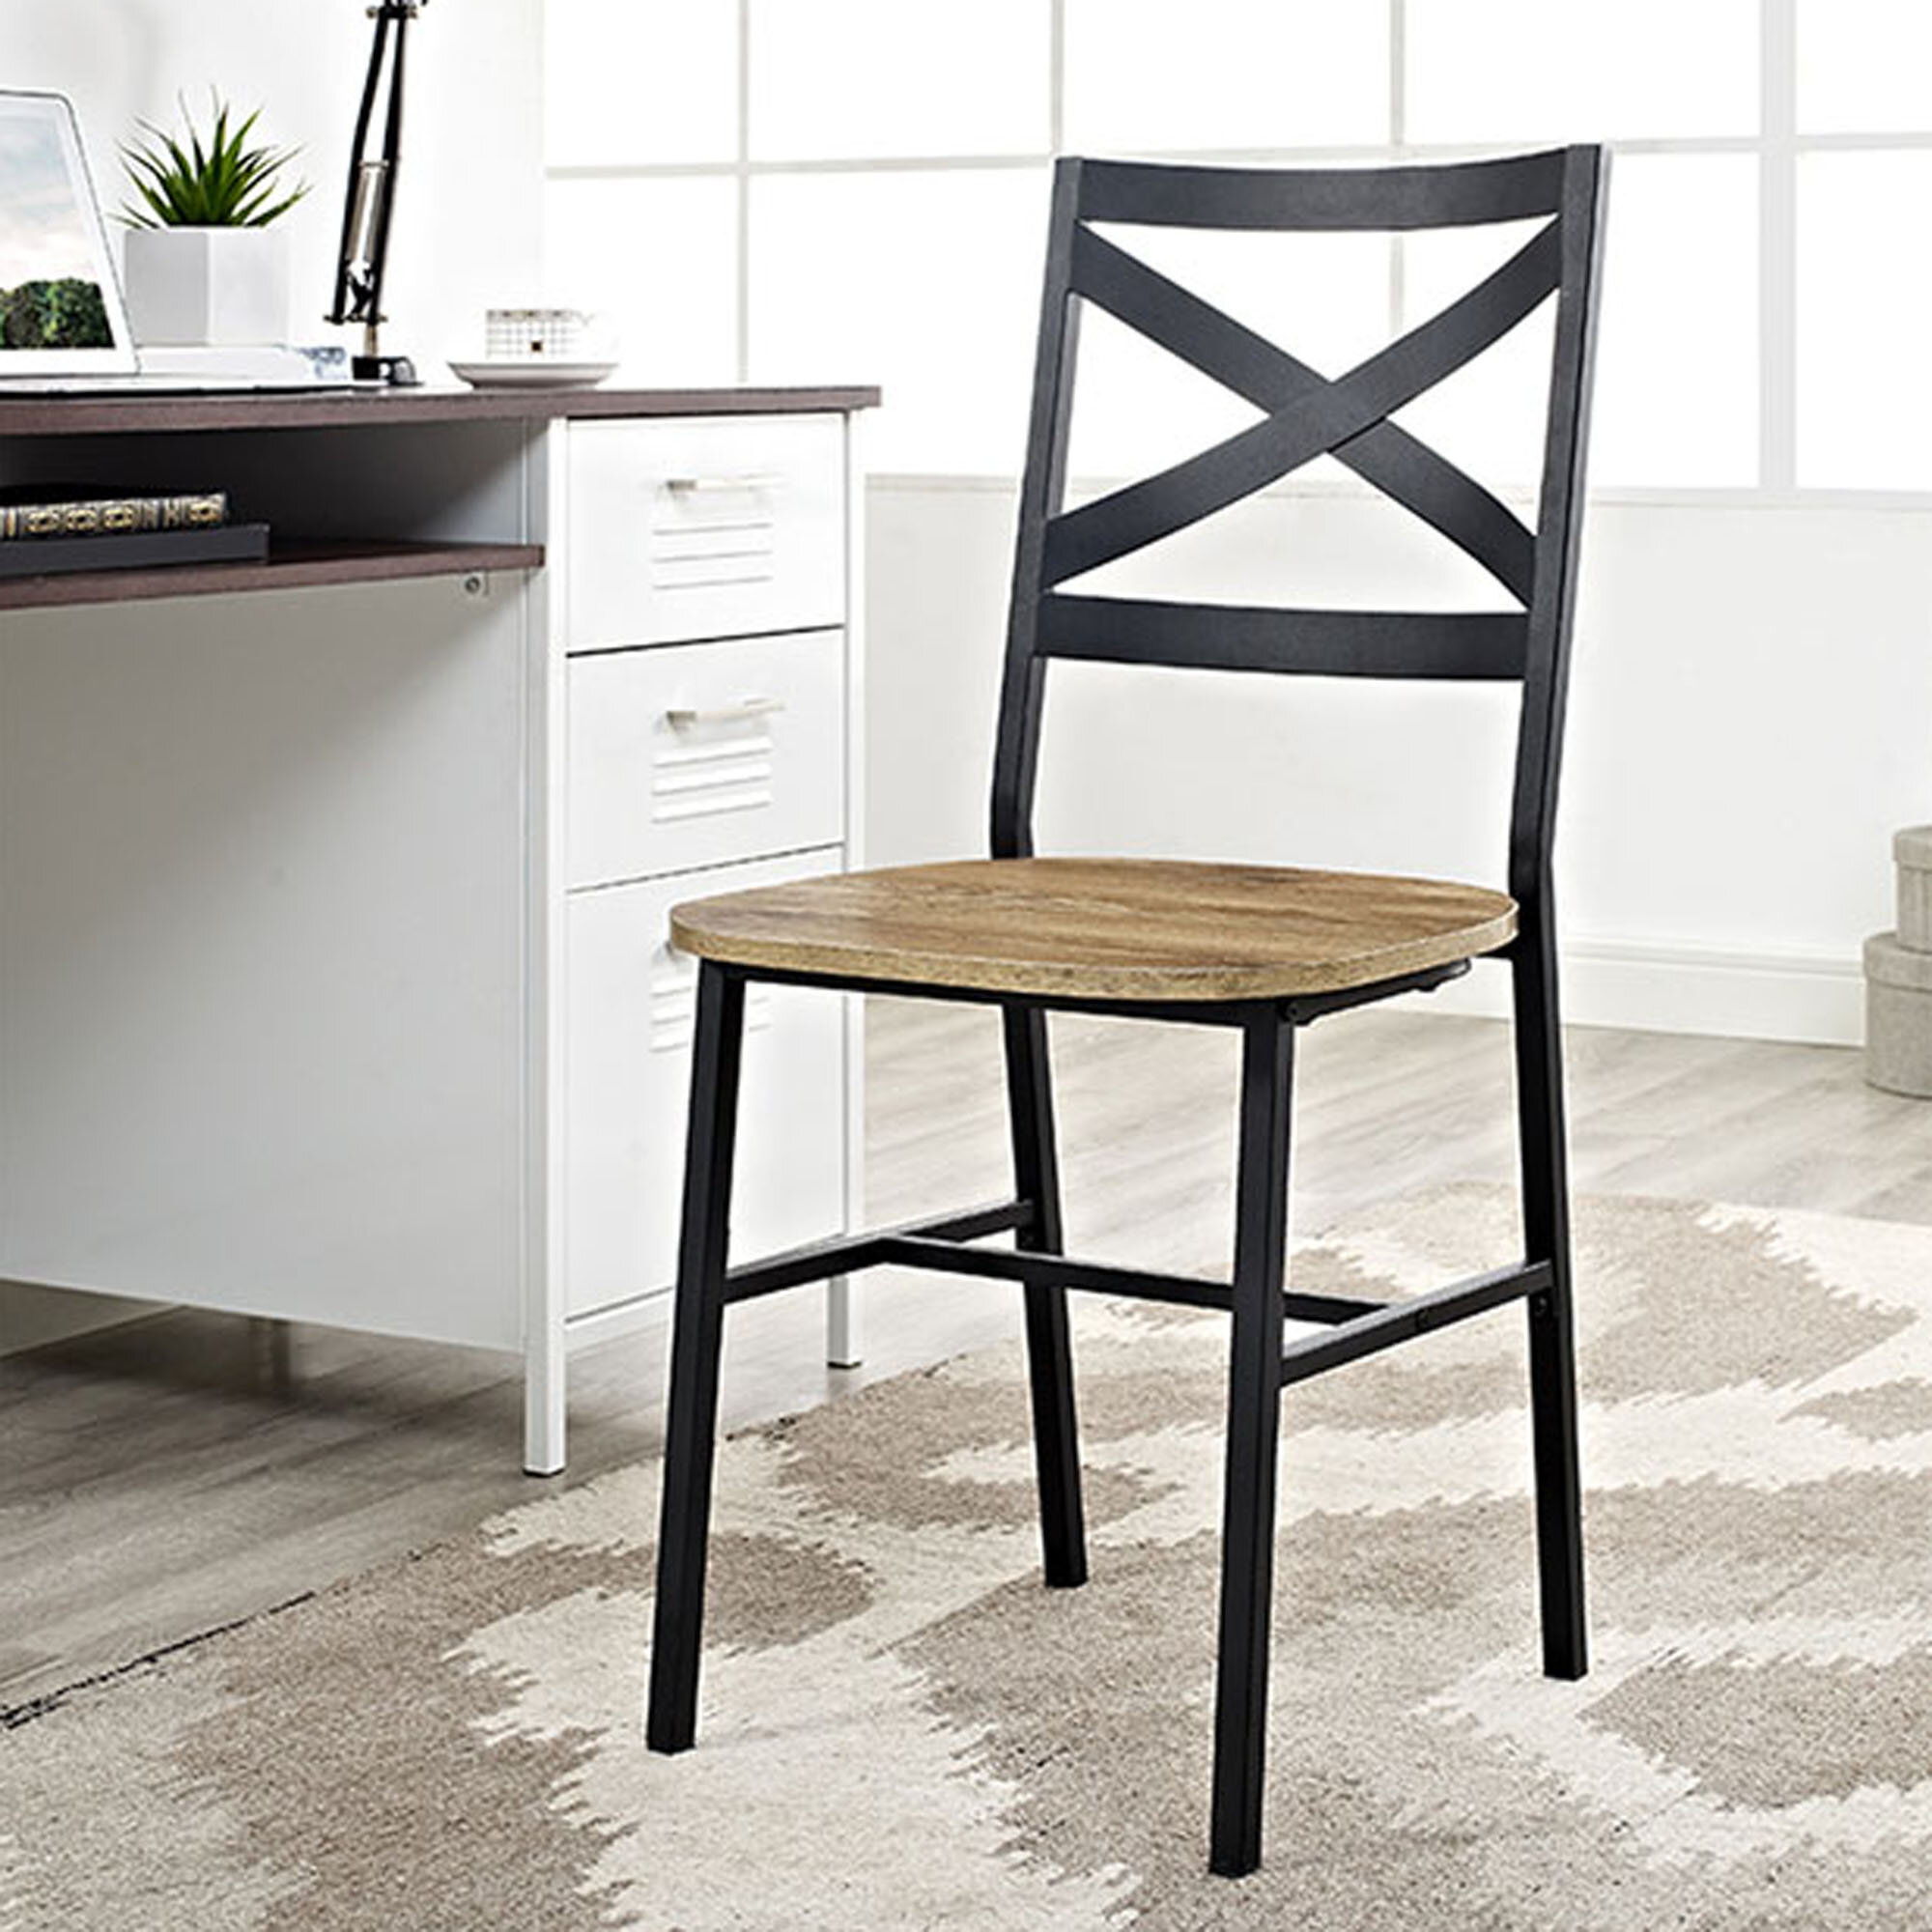 Laurel Foundry Modern Farmhouse Madelyn Dining Chair U0026 Reviews | Wayfair